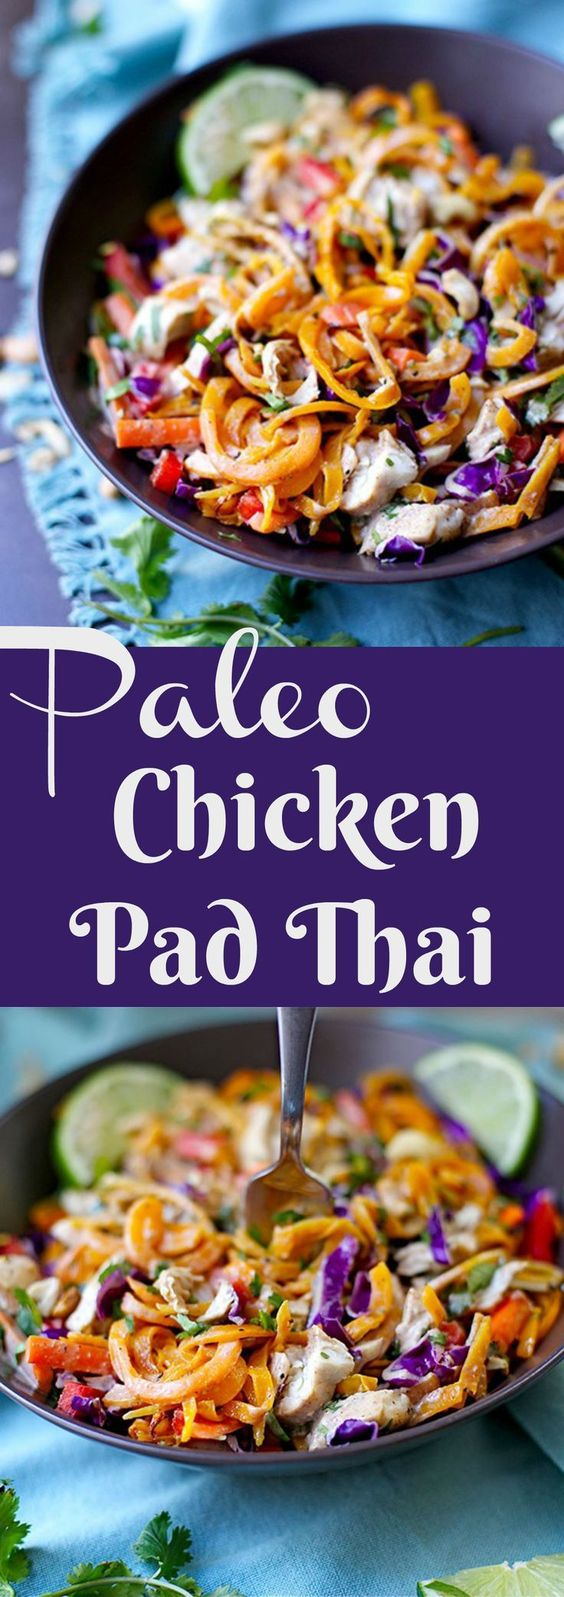 Keto Paleo Chicken Pad Thai